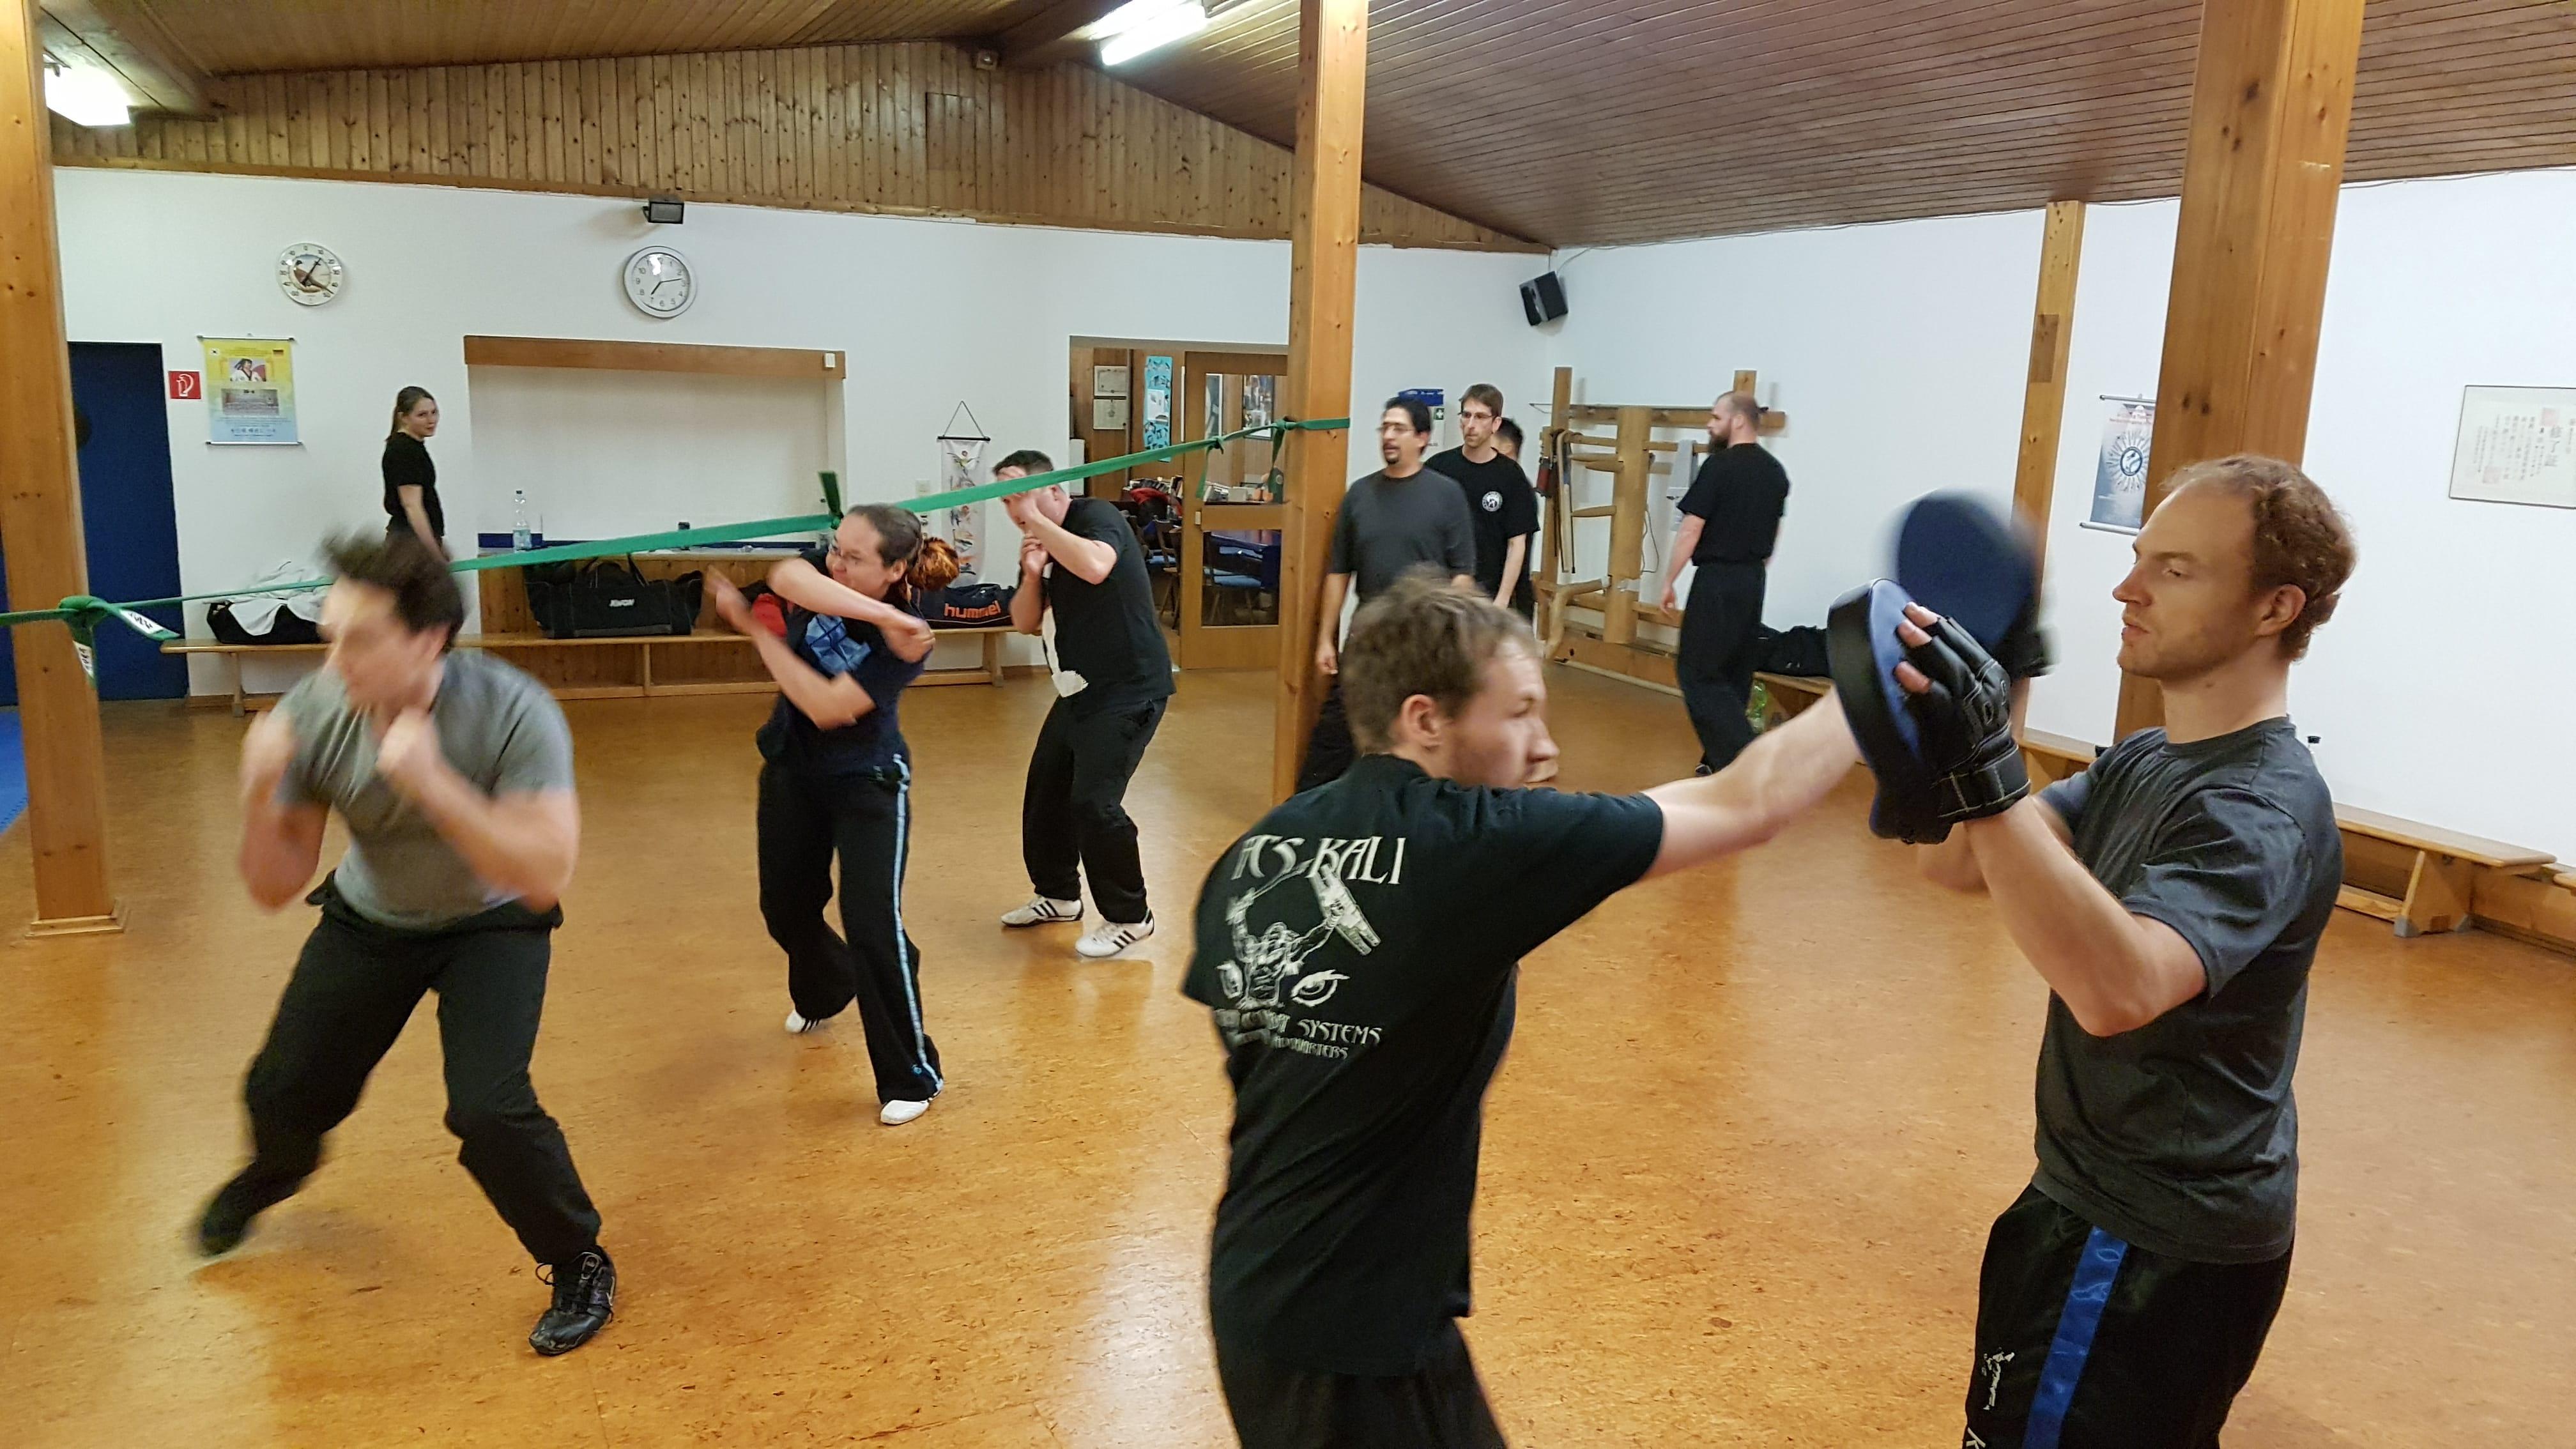 Kampfsport Kampfkunst Ansbach Selbstverteidigung Budo club Harloff